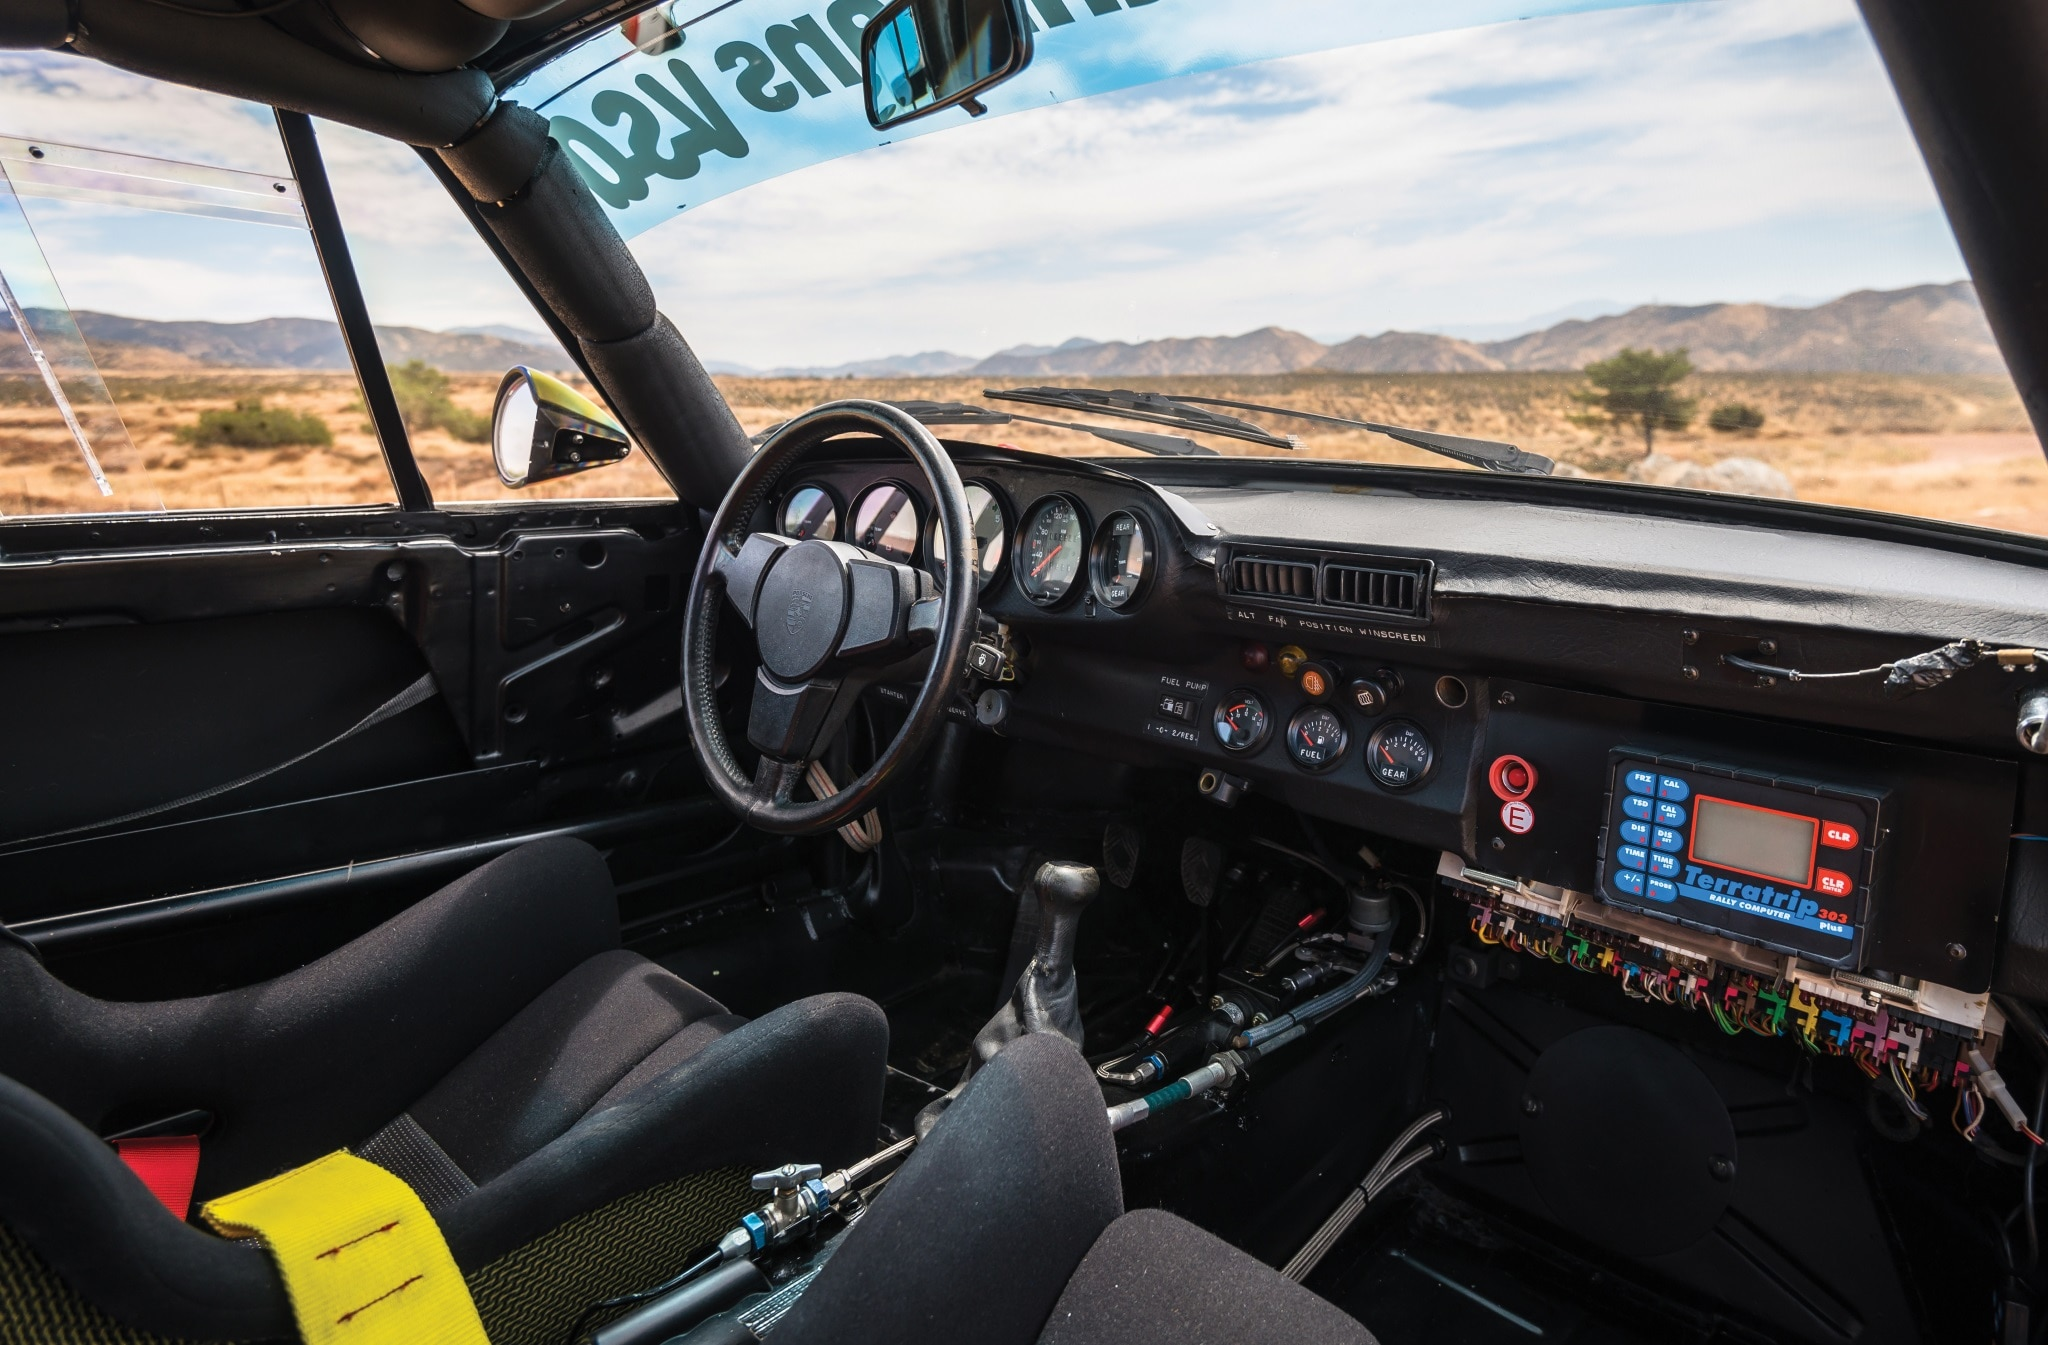 Porsche 959 For Sale >> Want to Own a 1985 Paris-Dakar Porsche 959 Rally Car? Here's Your Chance   Automobile Magazine